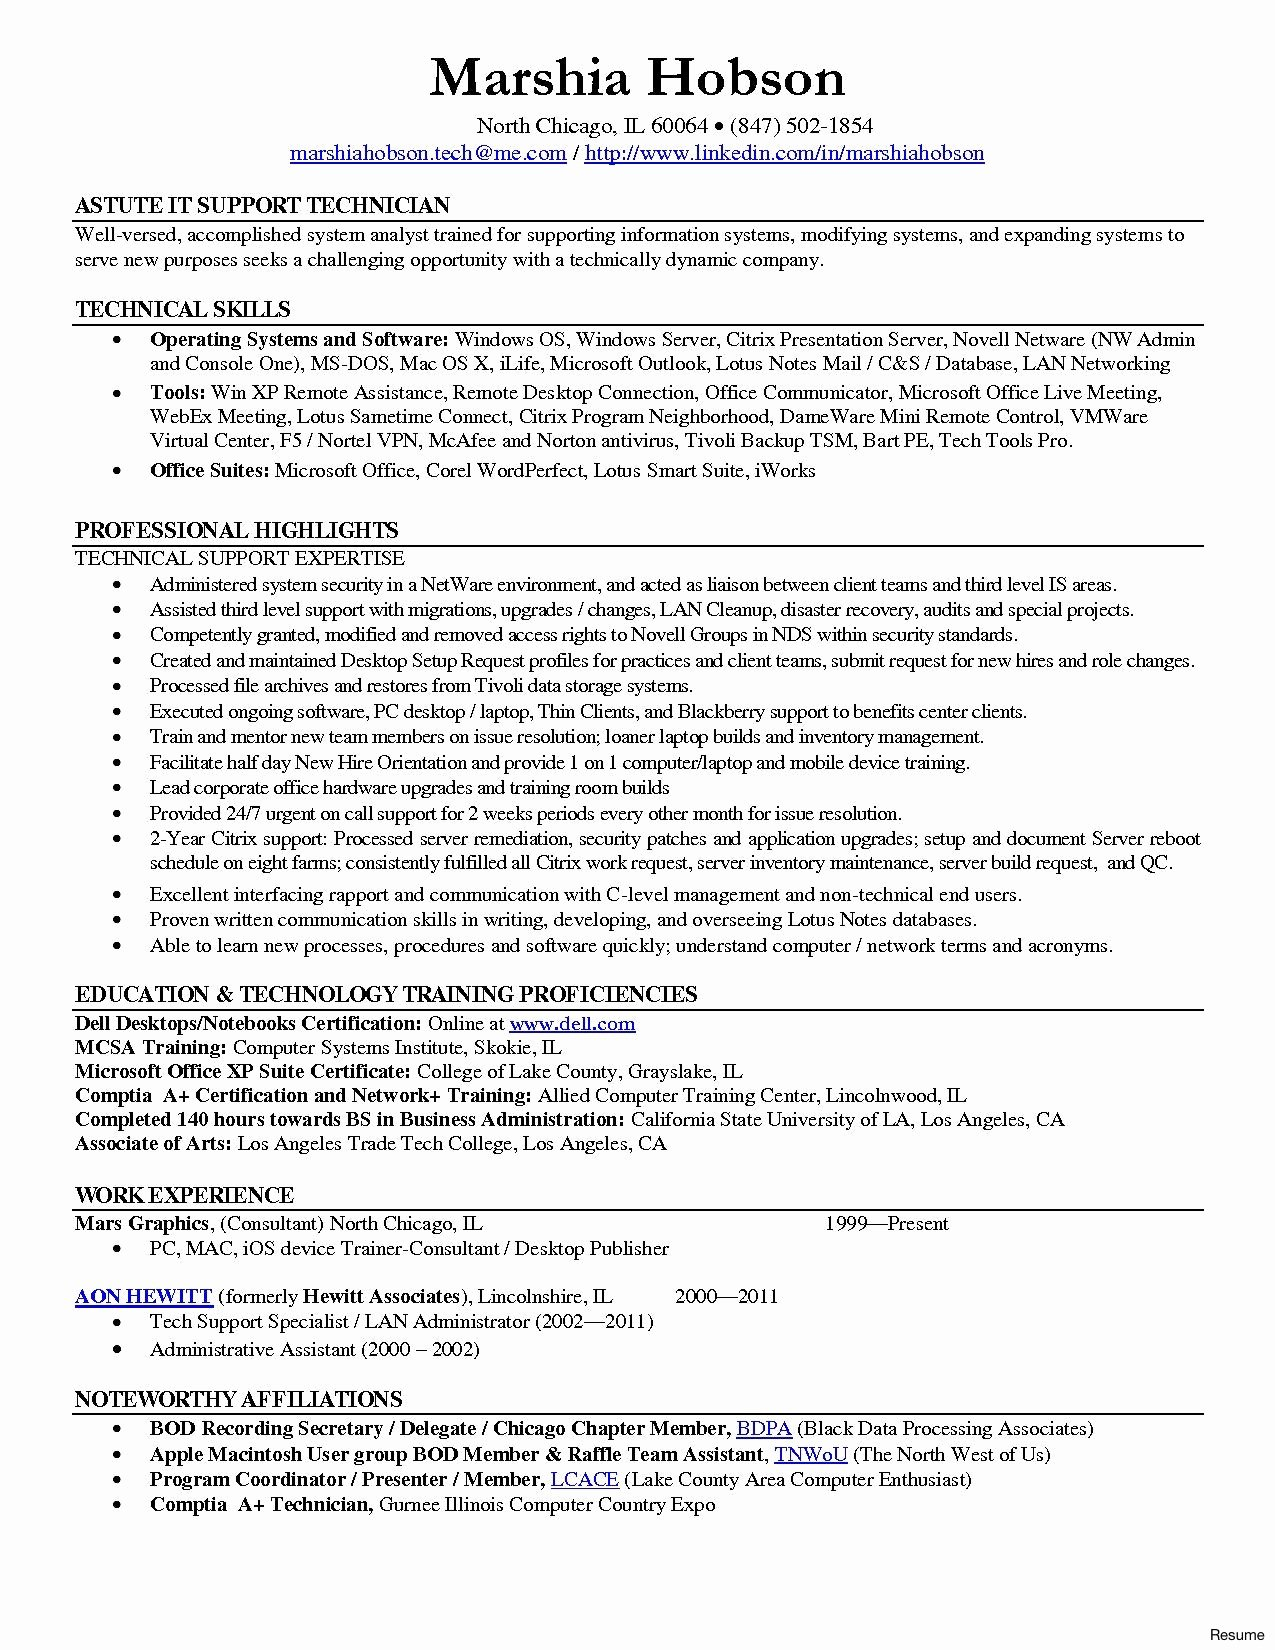 Puter Technician Resume Example